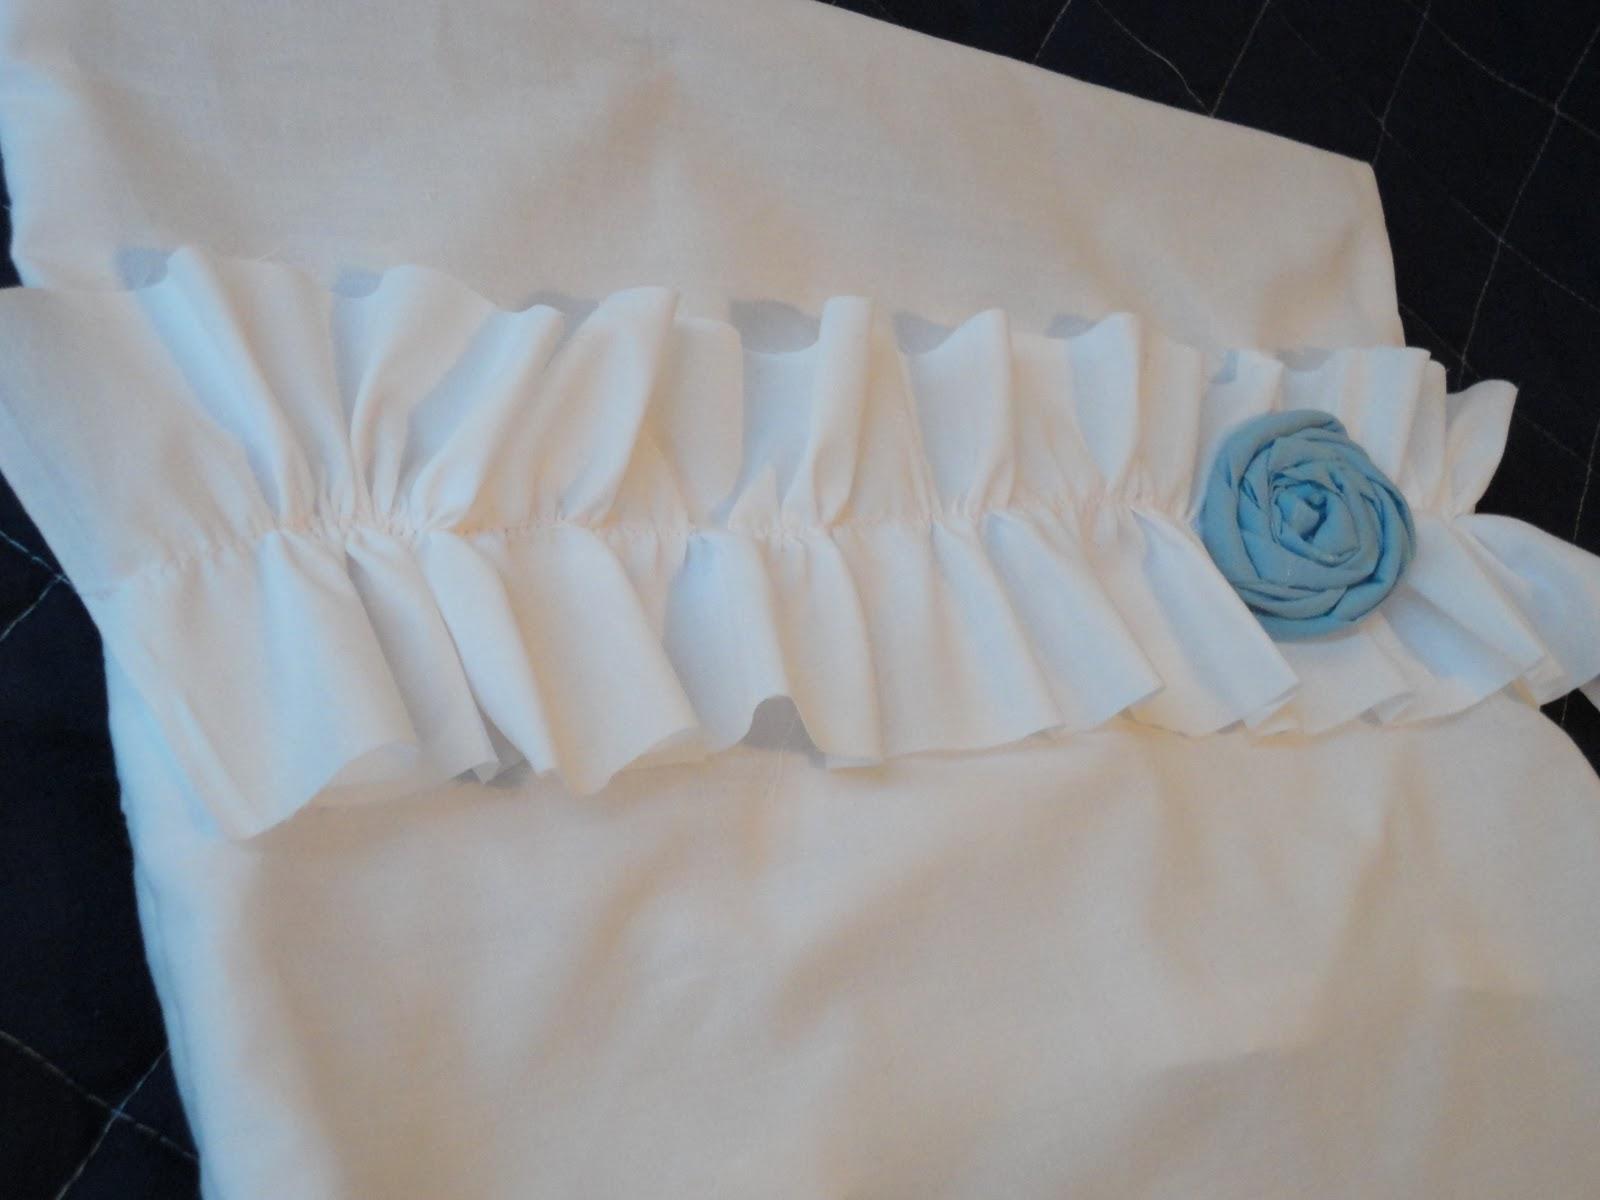 Ruffle Pillow | Occasionally Crafty: Ruffle Pillow